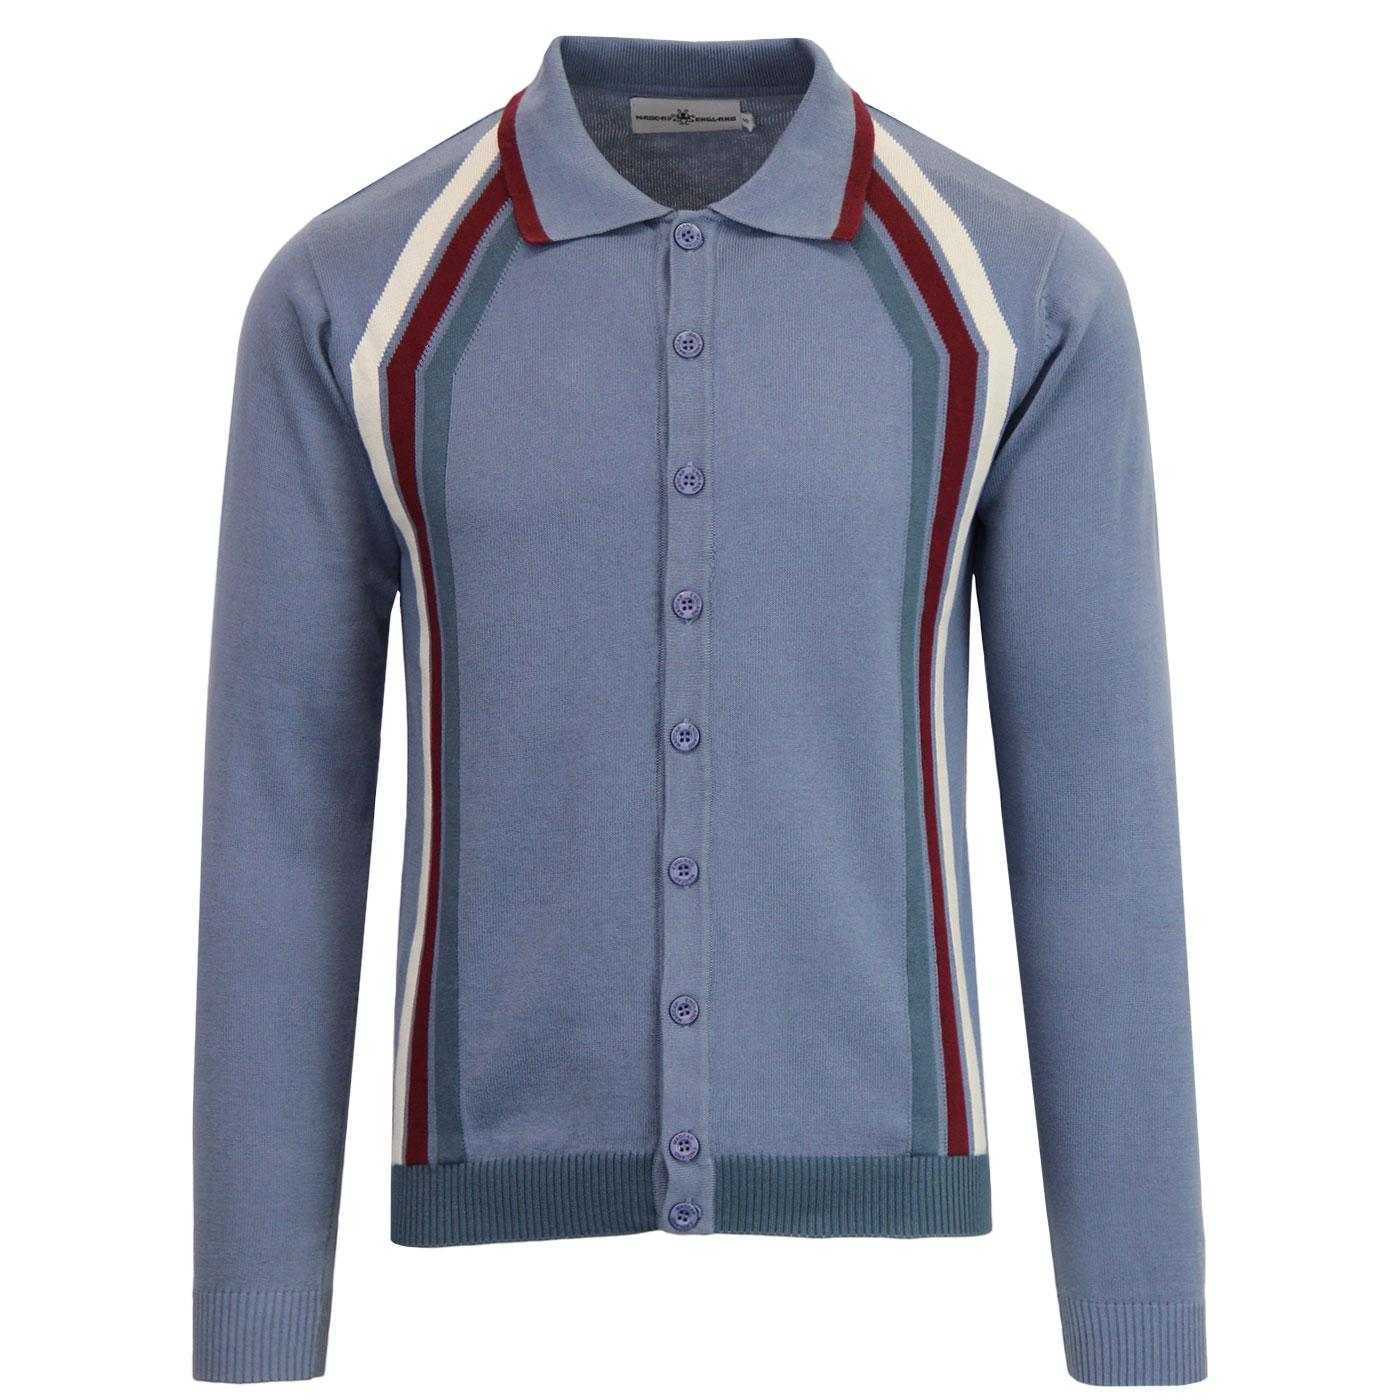 Blast MADCAP ENGLAND Mod Stripe Polo Cardigan (F)